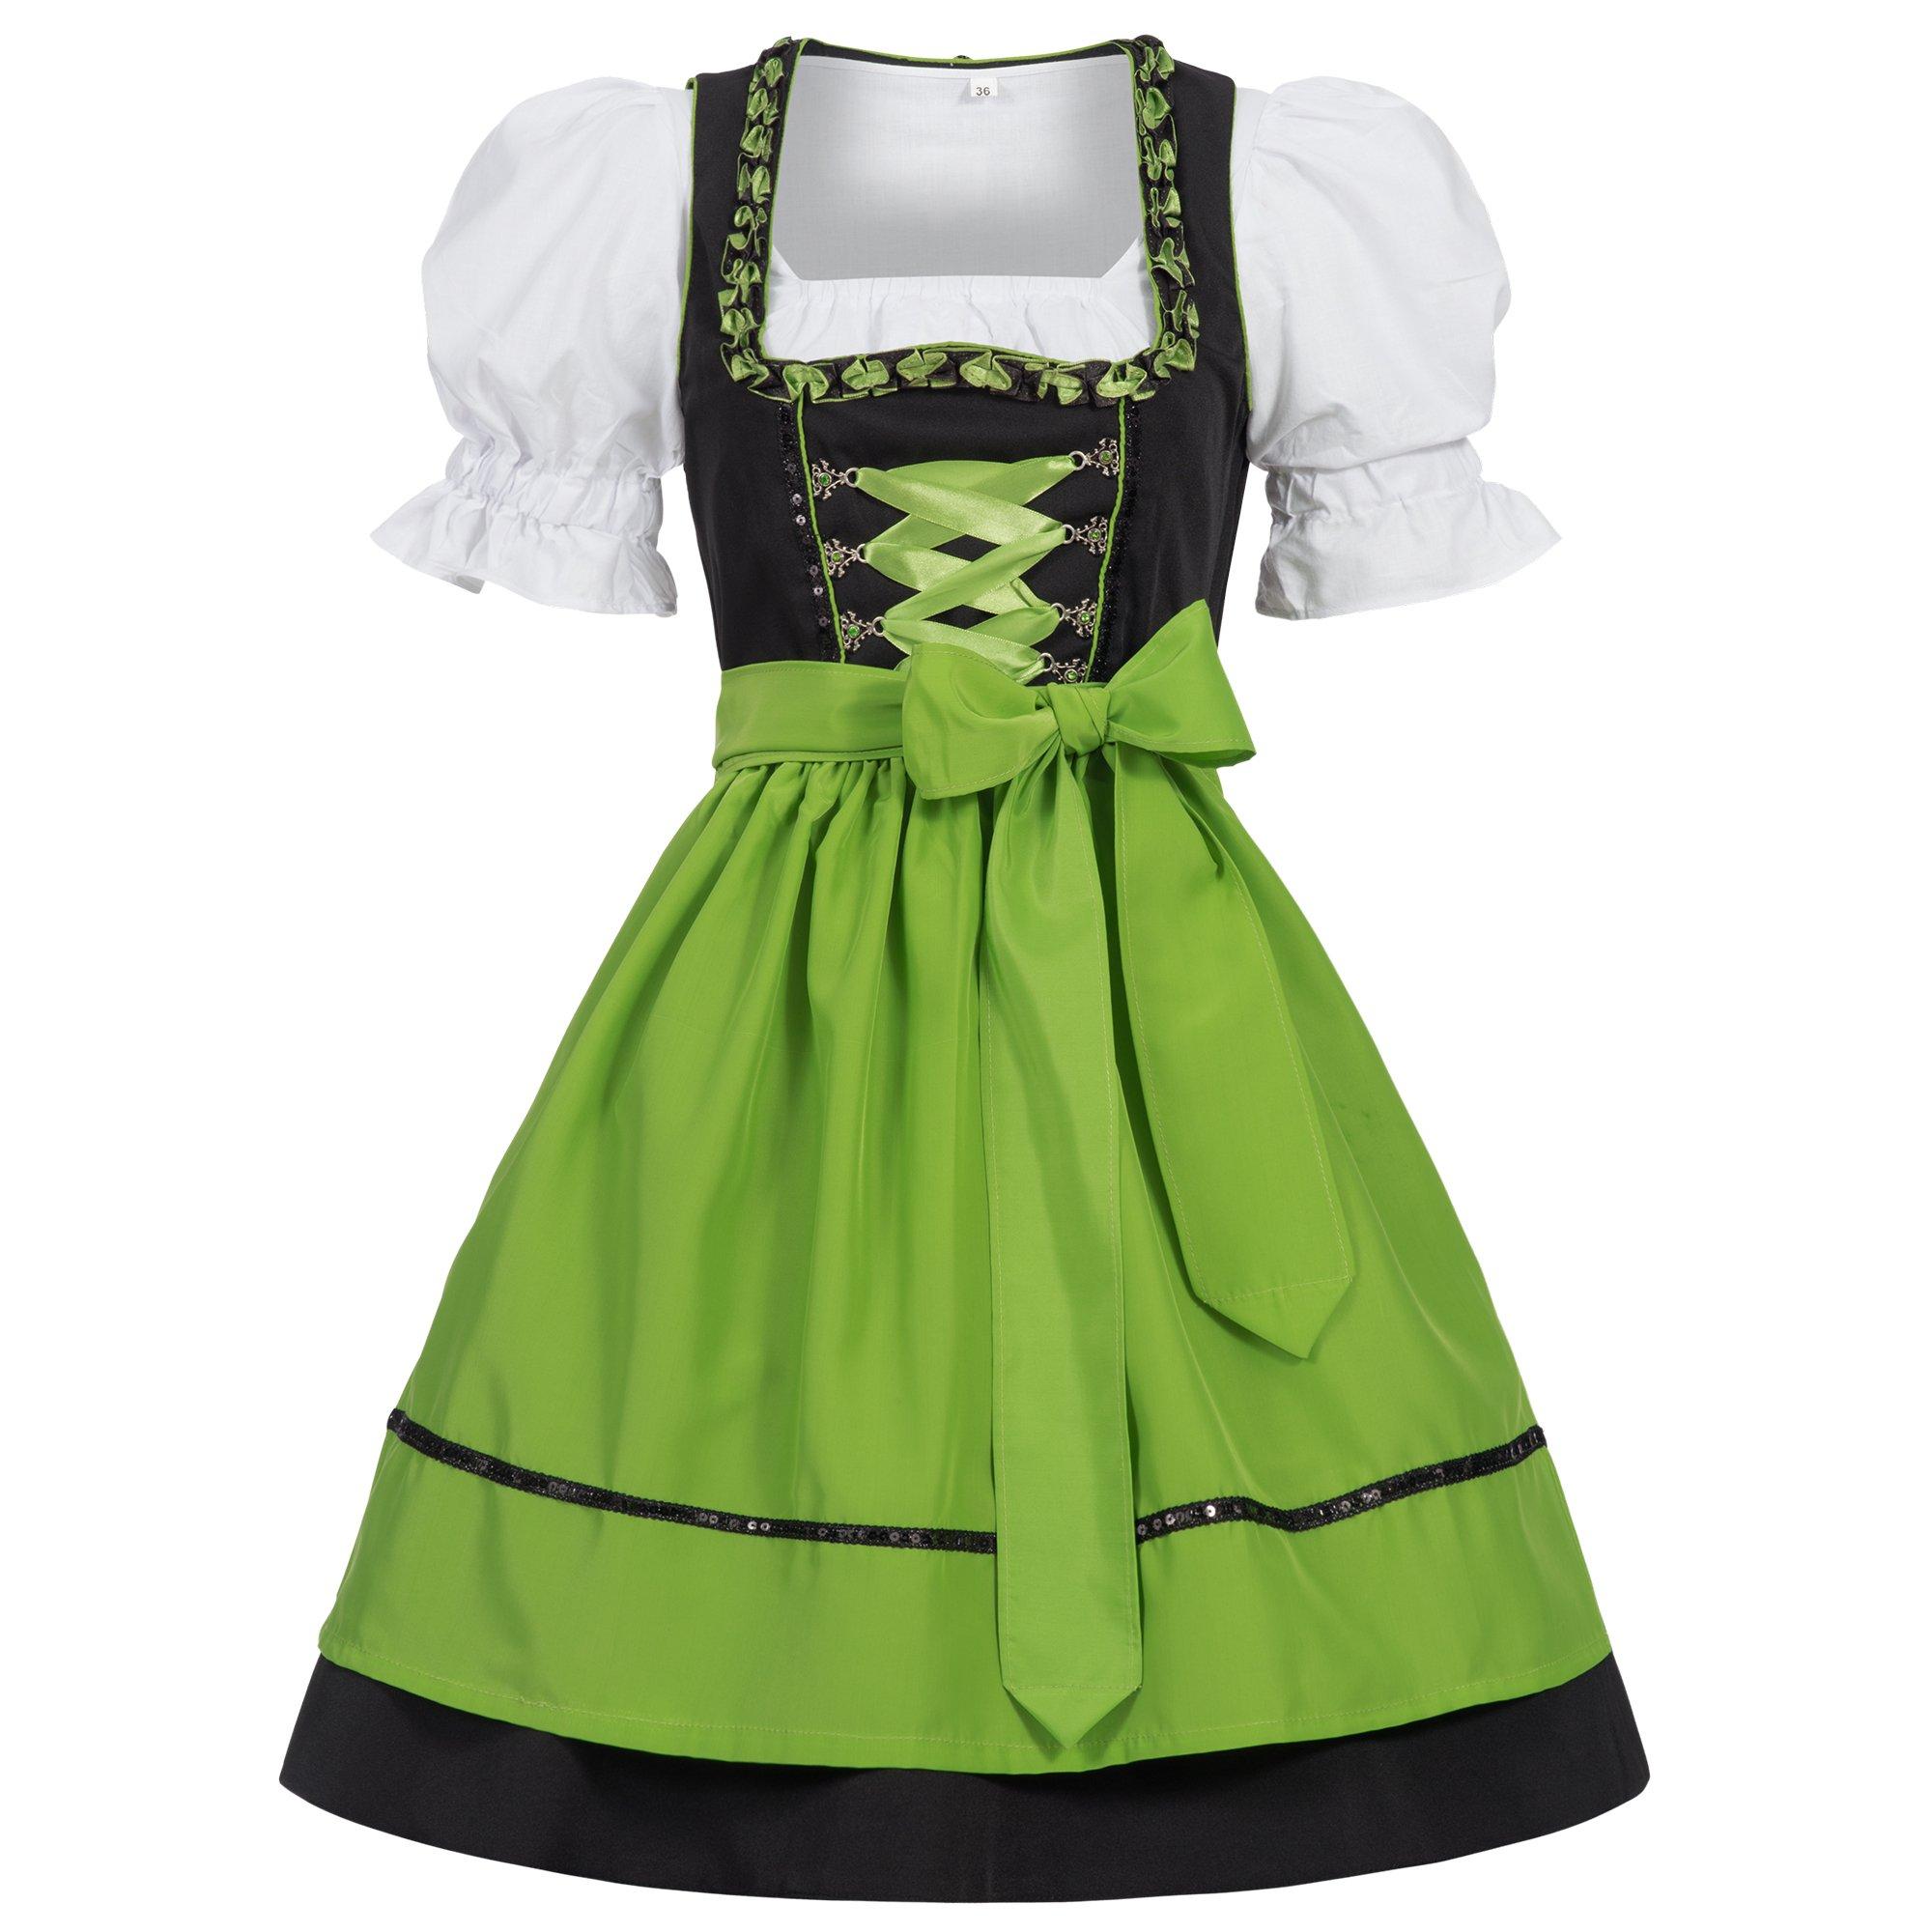 685f9ae3ecad4 Get Quotations · Women s German Dirndl Dress Costumes for Bavarian  Oktoberfest Carnival Halloween